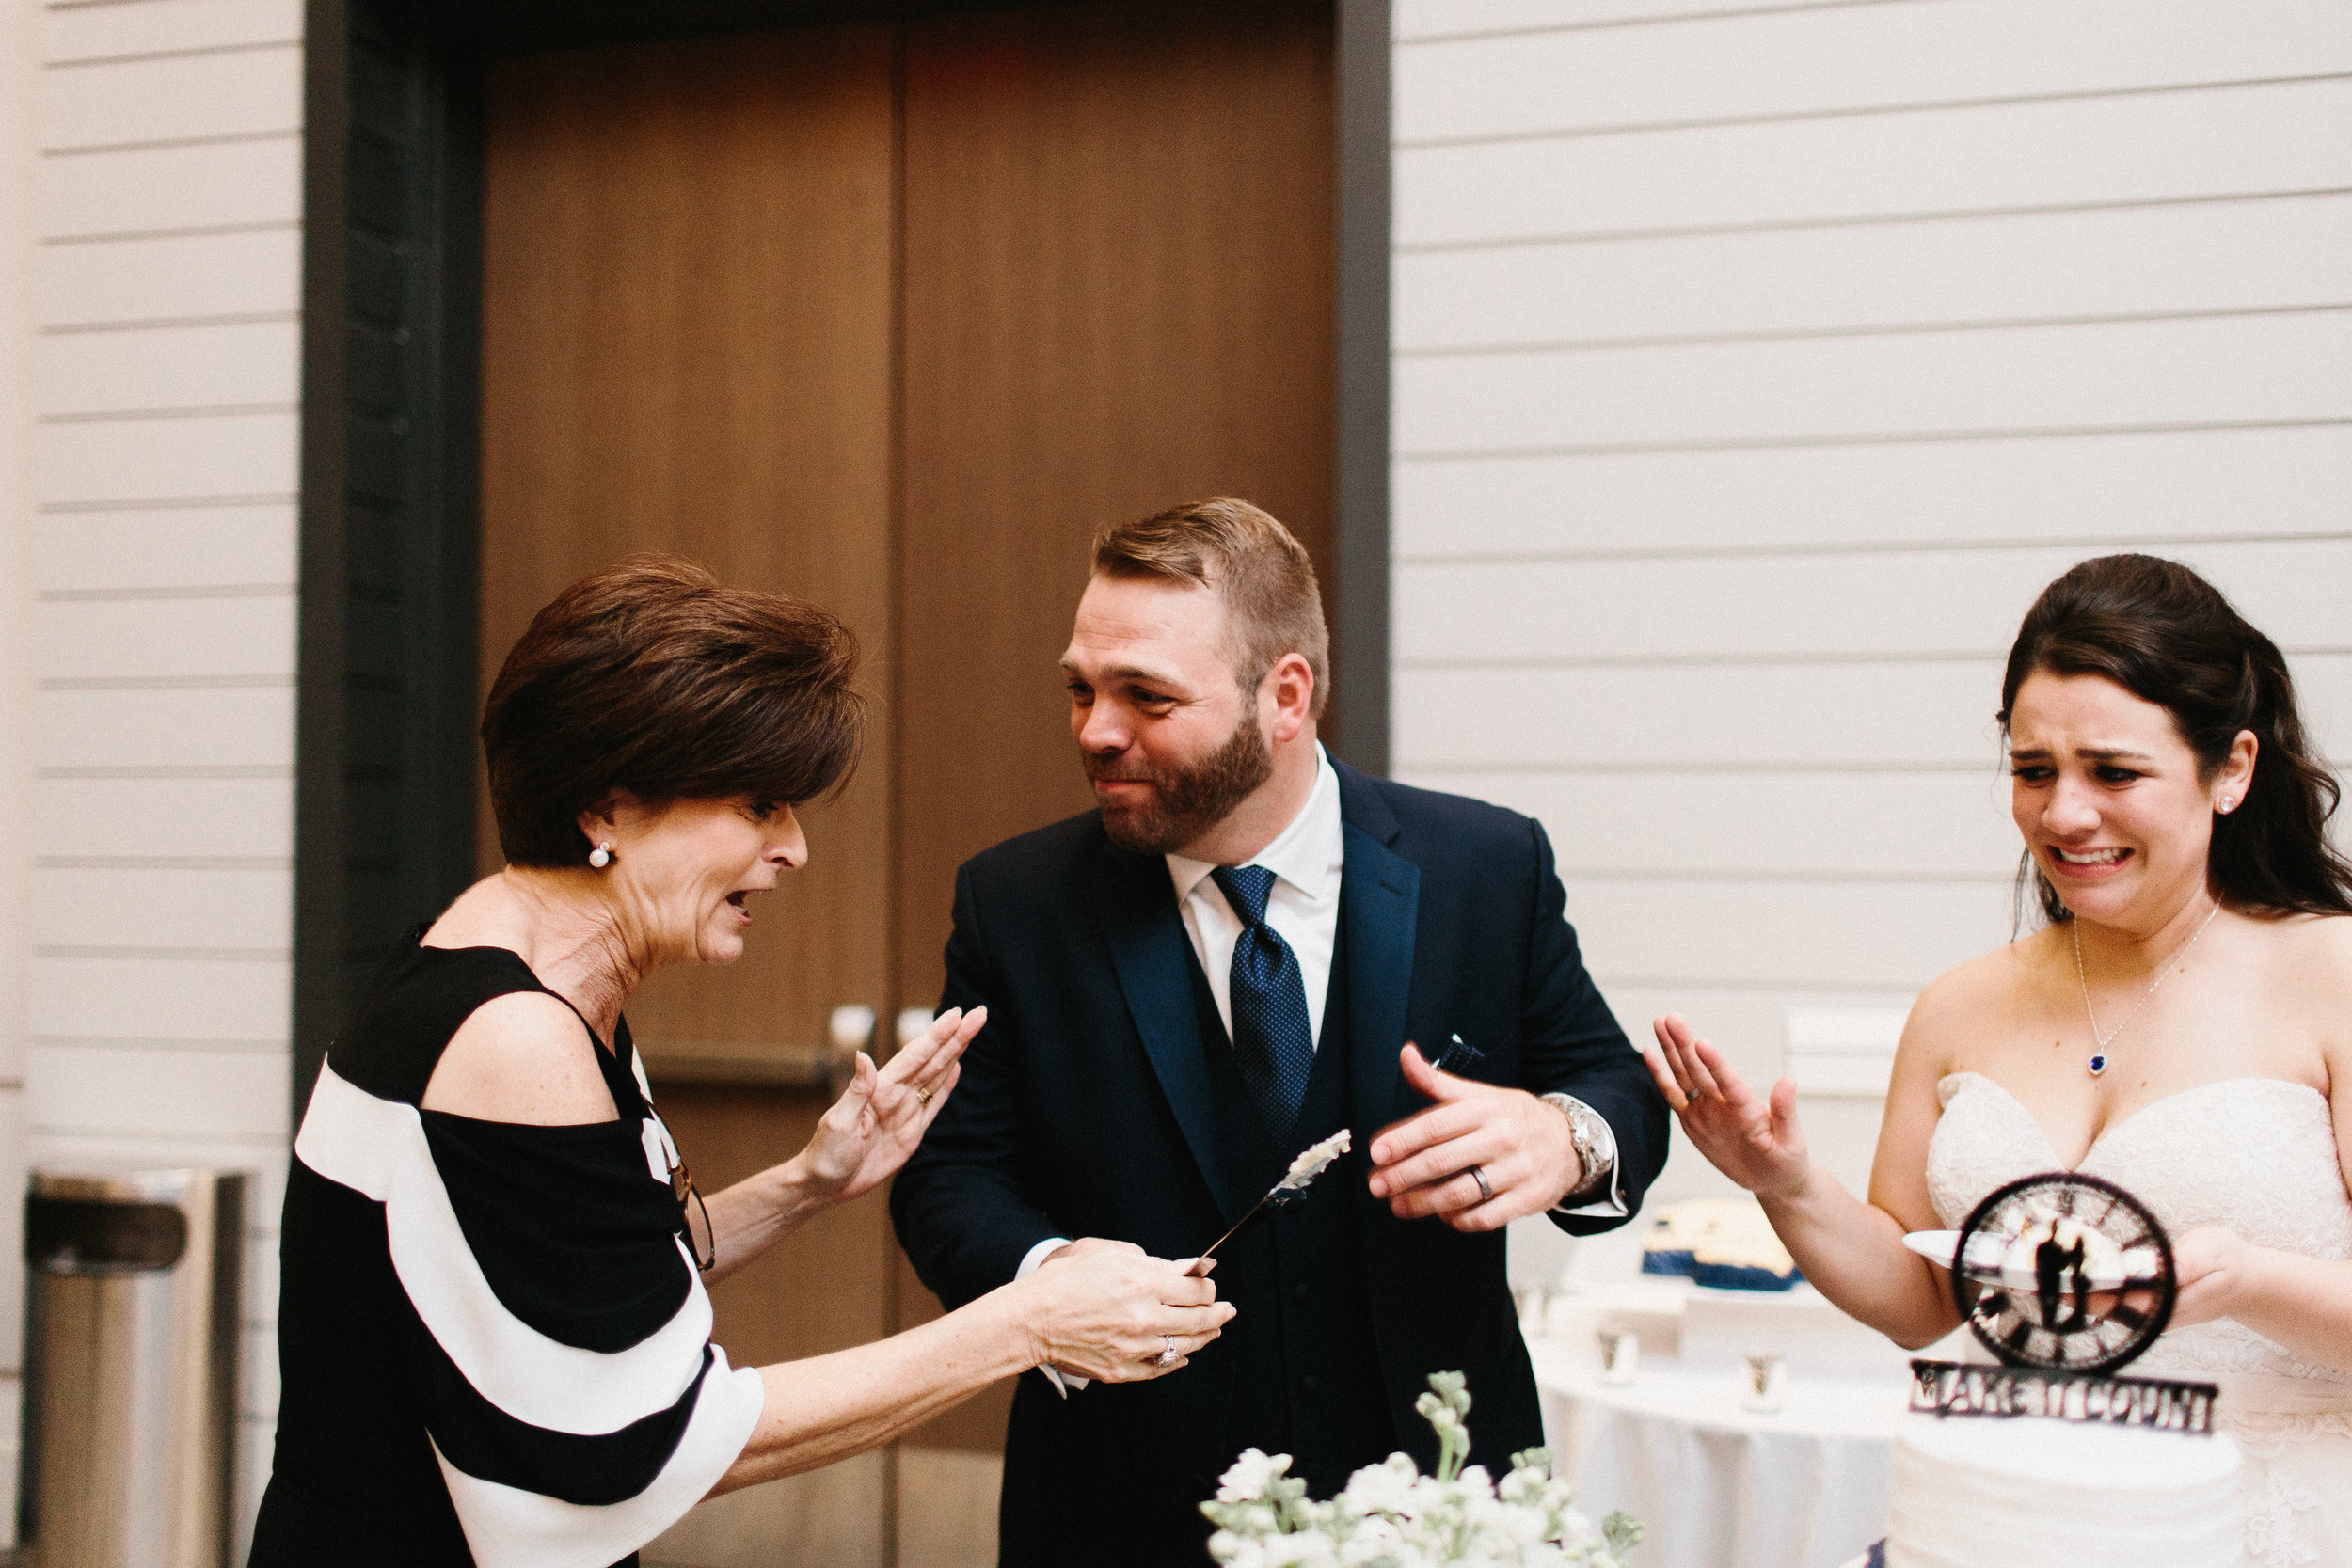 roswell_st_peter_chanel_catholic_avalon_hotel_alpharetta_wedding-2112.jpg